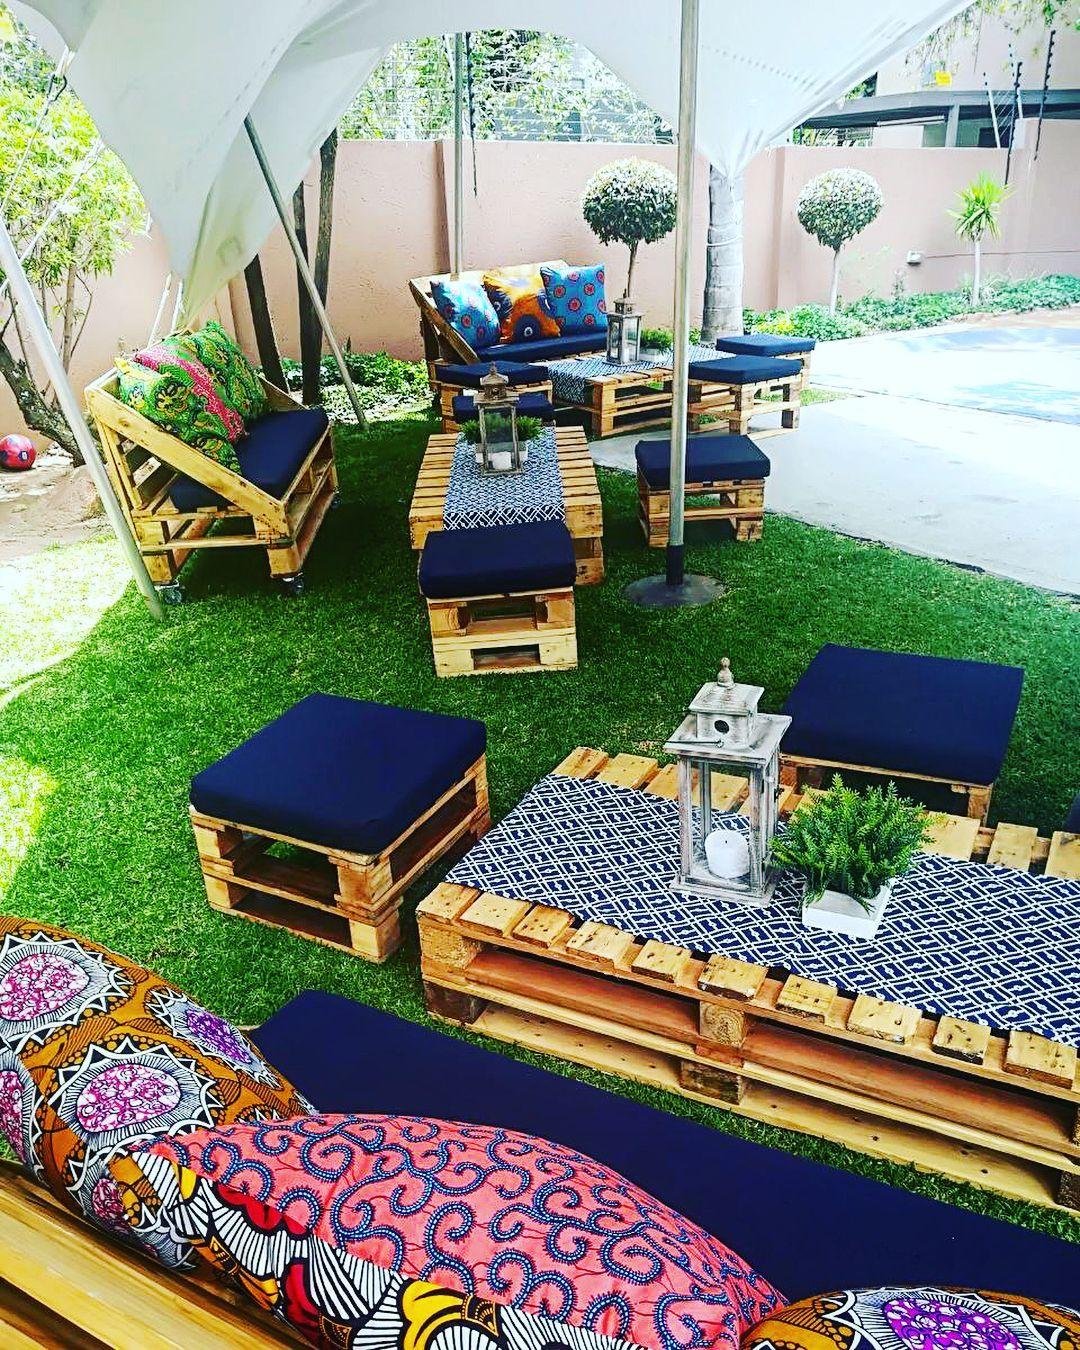 Garden Furniture Out Of Wooden Pallets Woodenoutdoorfurniture Mobilier De Salon Meuble Palette Decoration